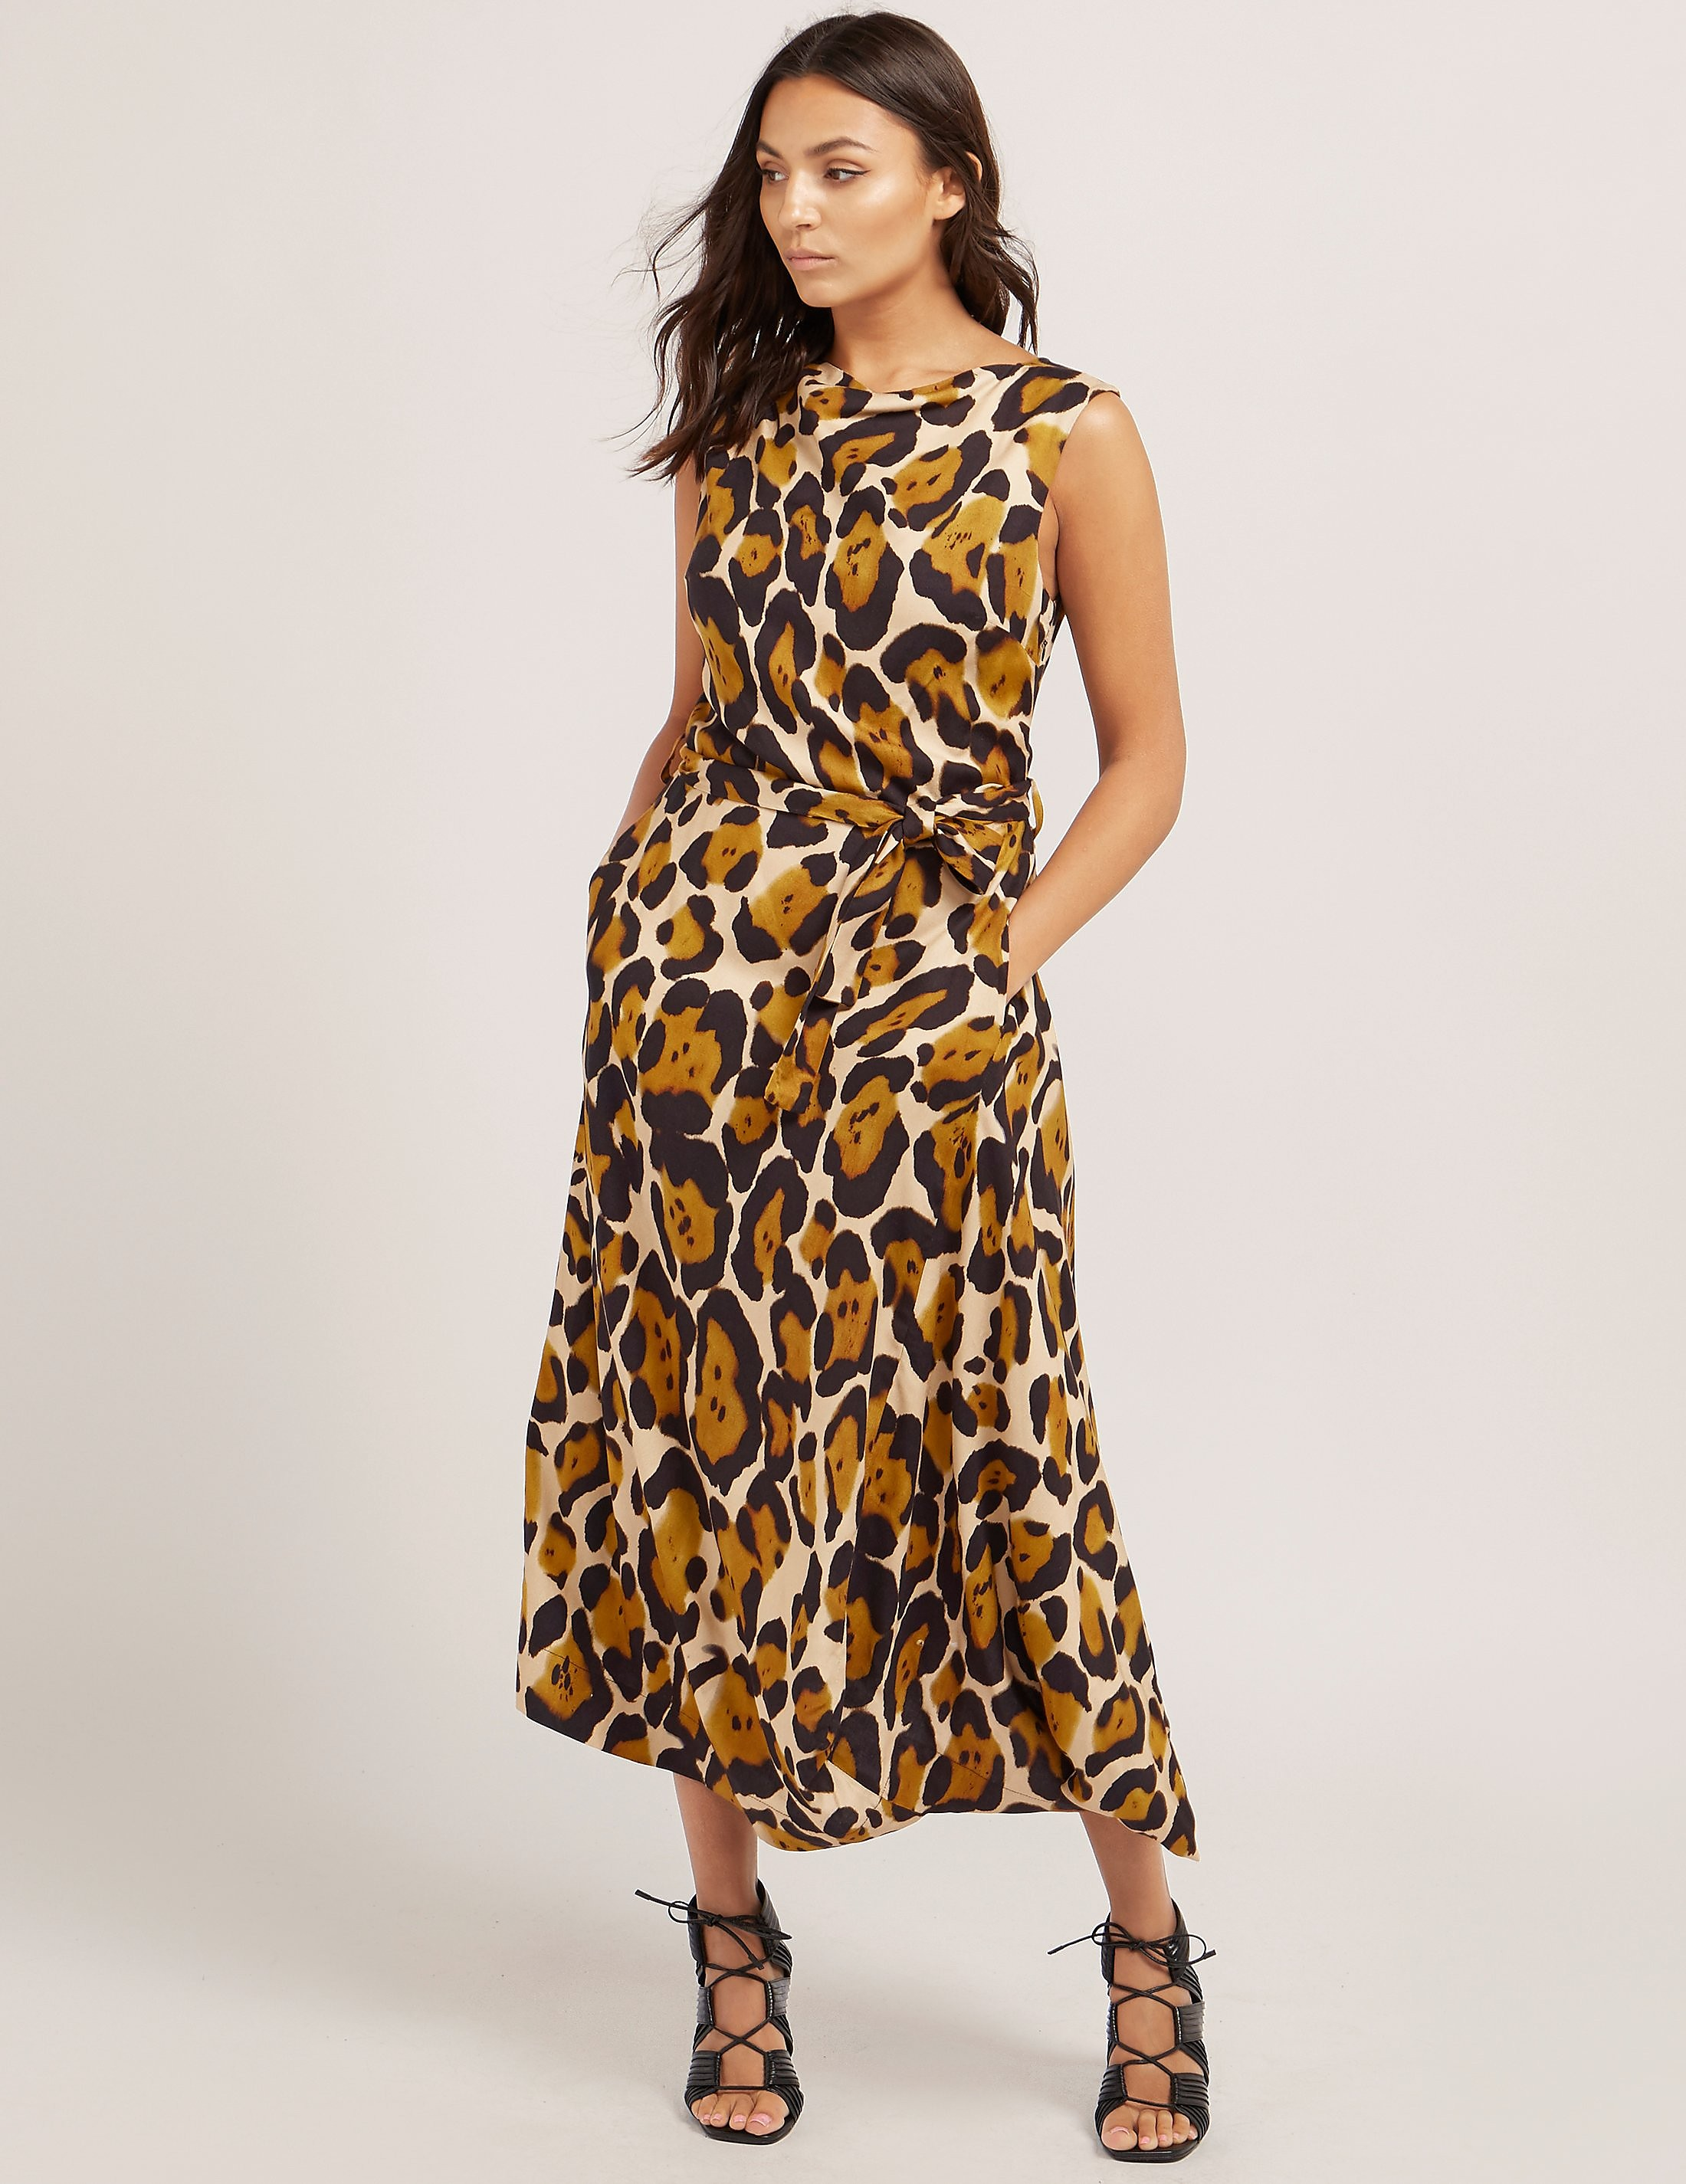 Vivienne Westwood Anglomania Vasari Dress